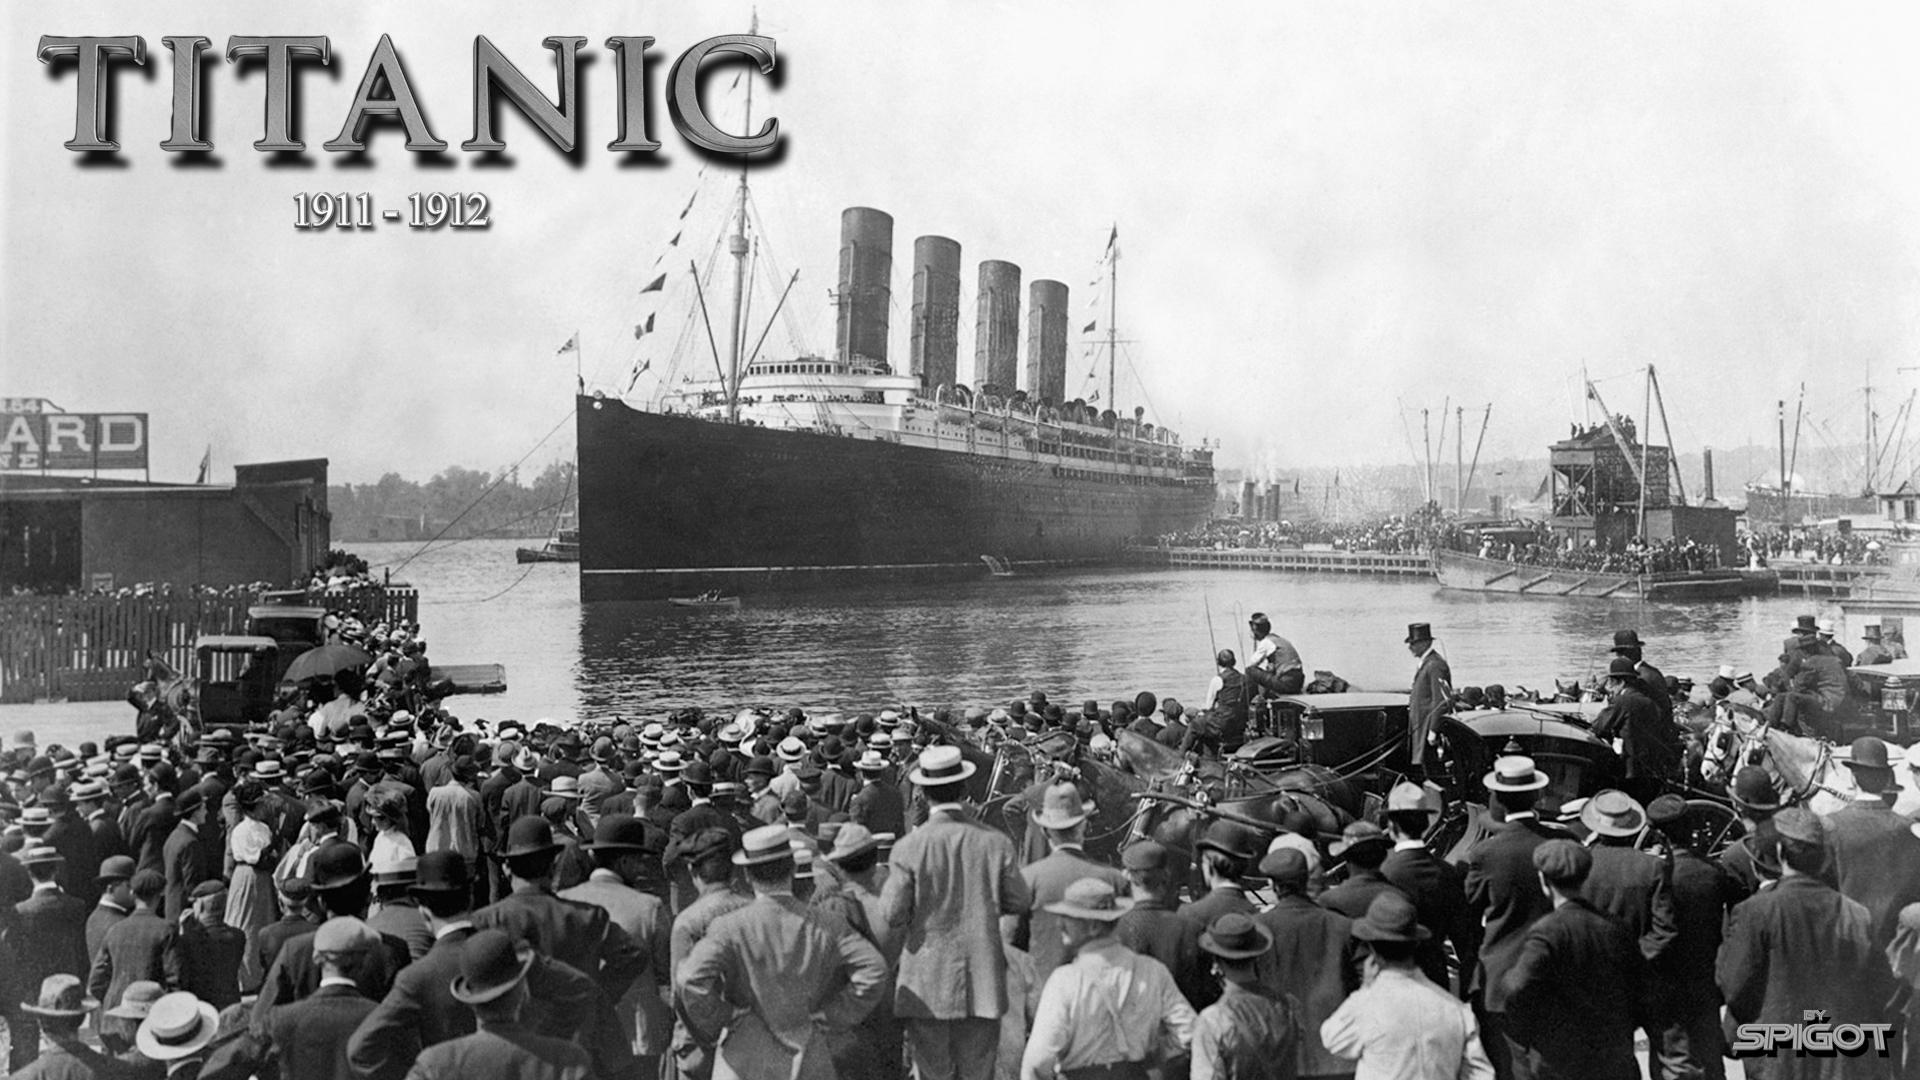 titanic-01-wallpaper